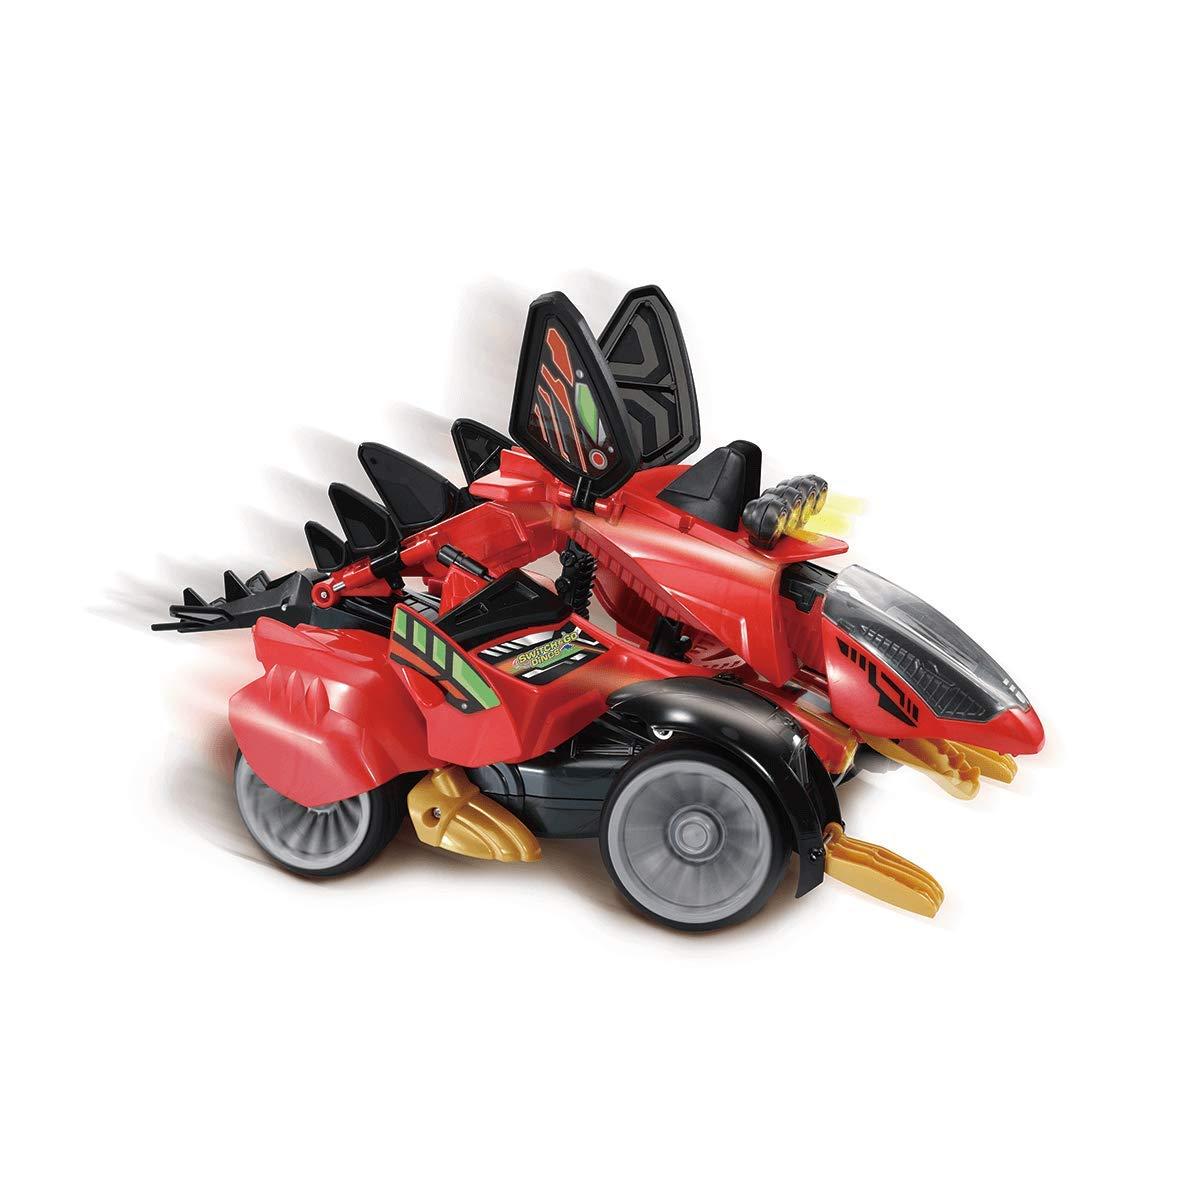 Toys & Games Dinosaurs & Prehistoric Creatures 5 VTech ...